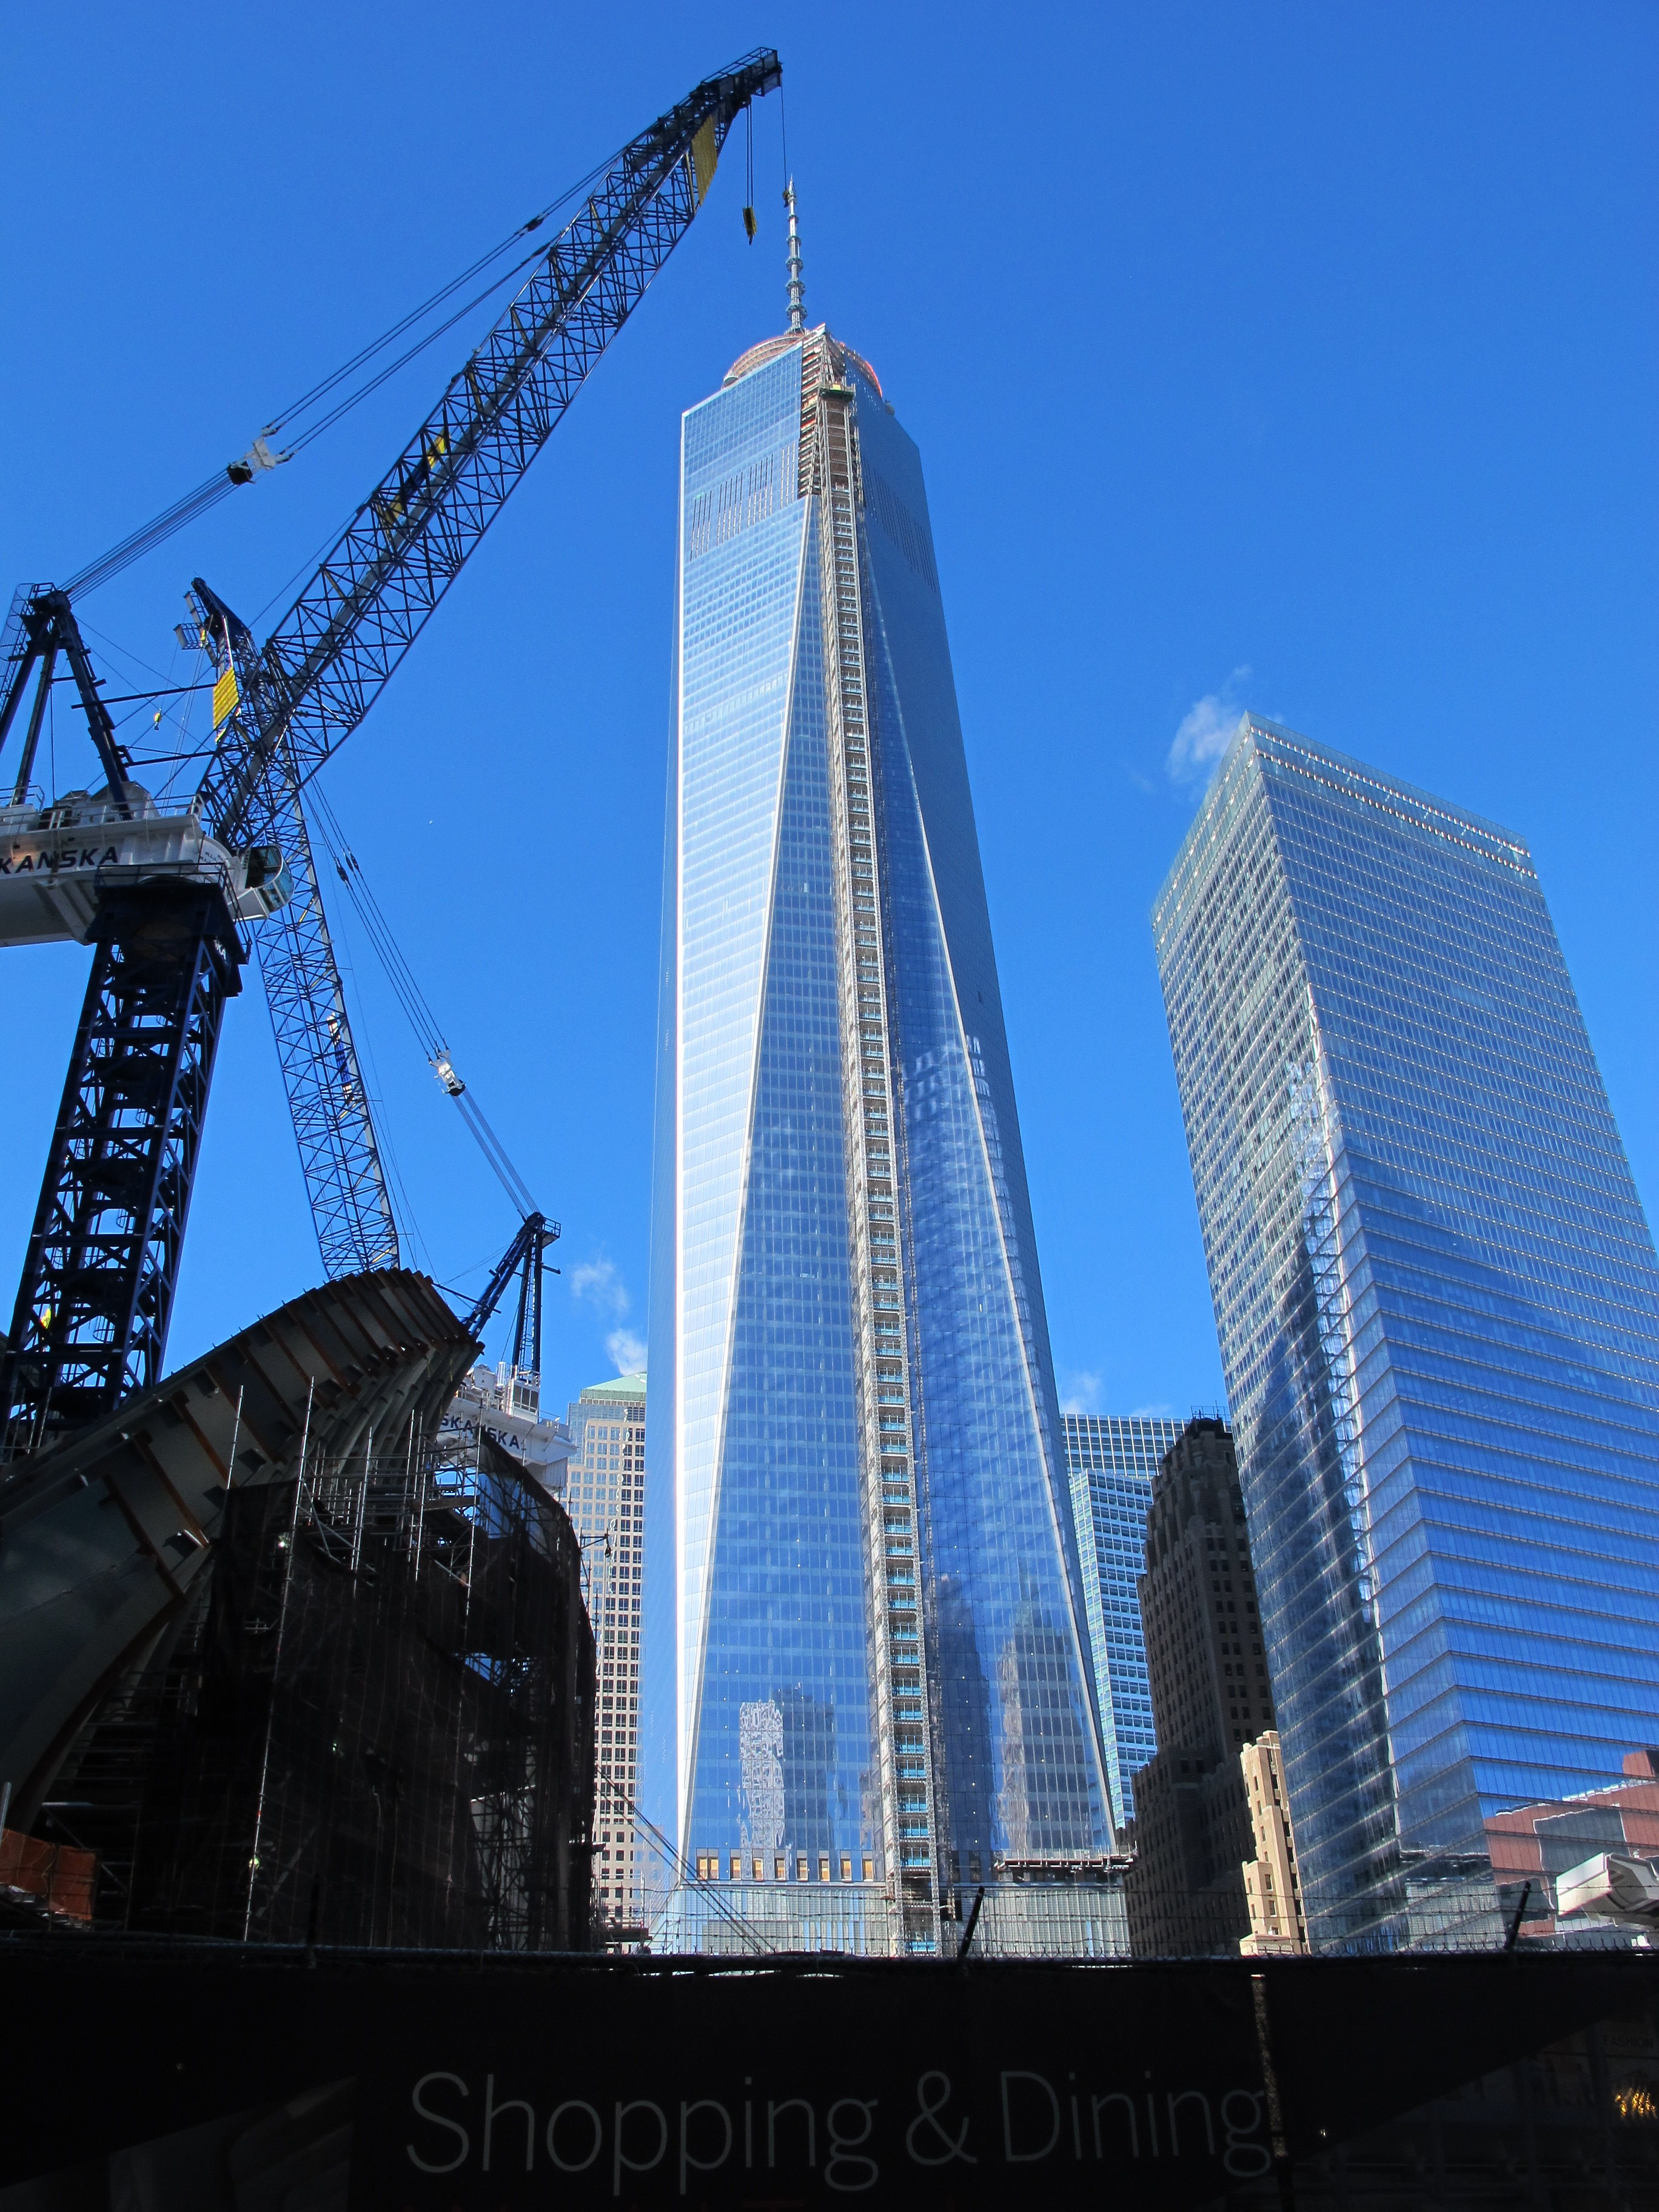 File:Freedom tower in costruzione, gennaio 2014.JPG ...